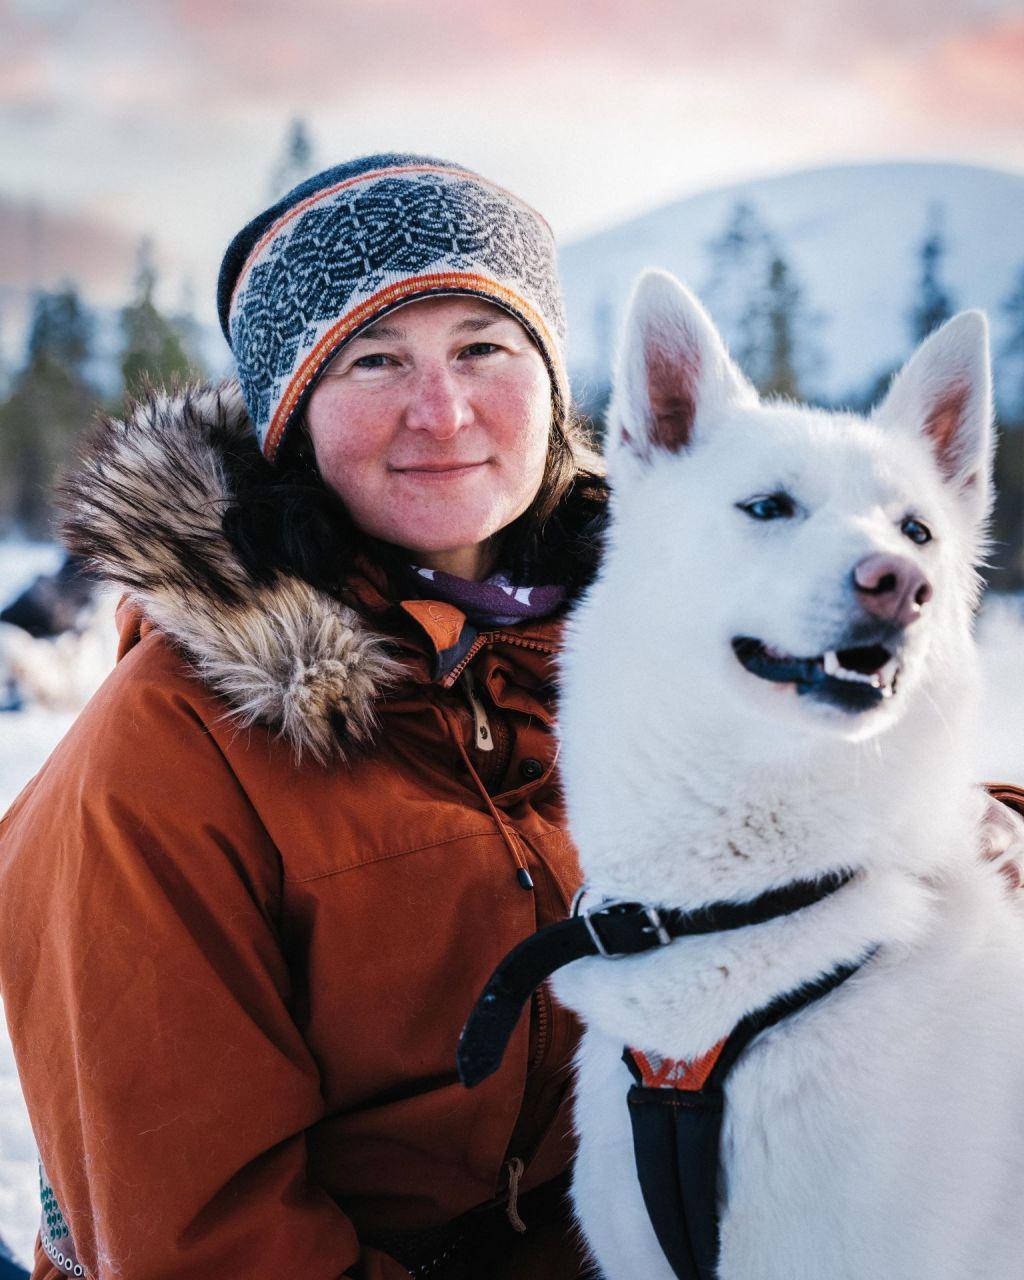 Aksana Kurola, entrepreneur of Yoga Nature, with her husky dog